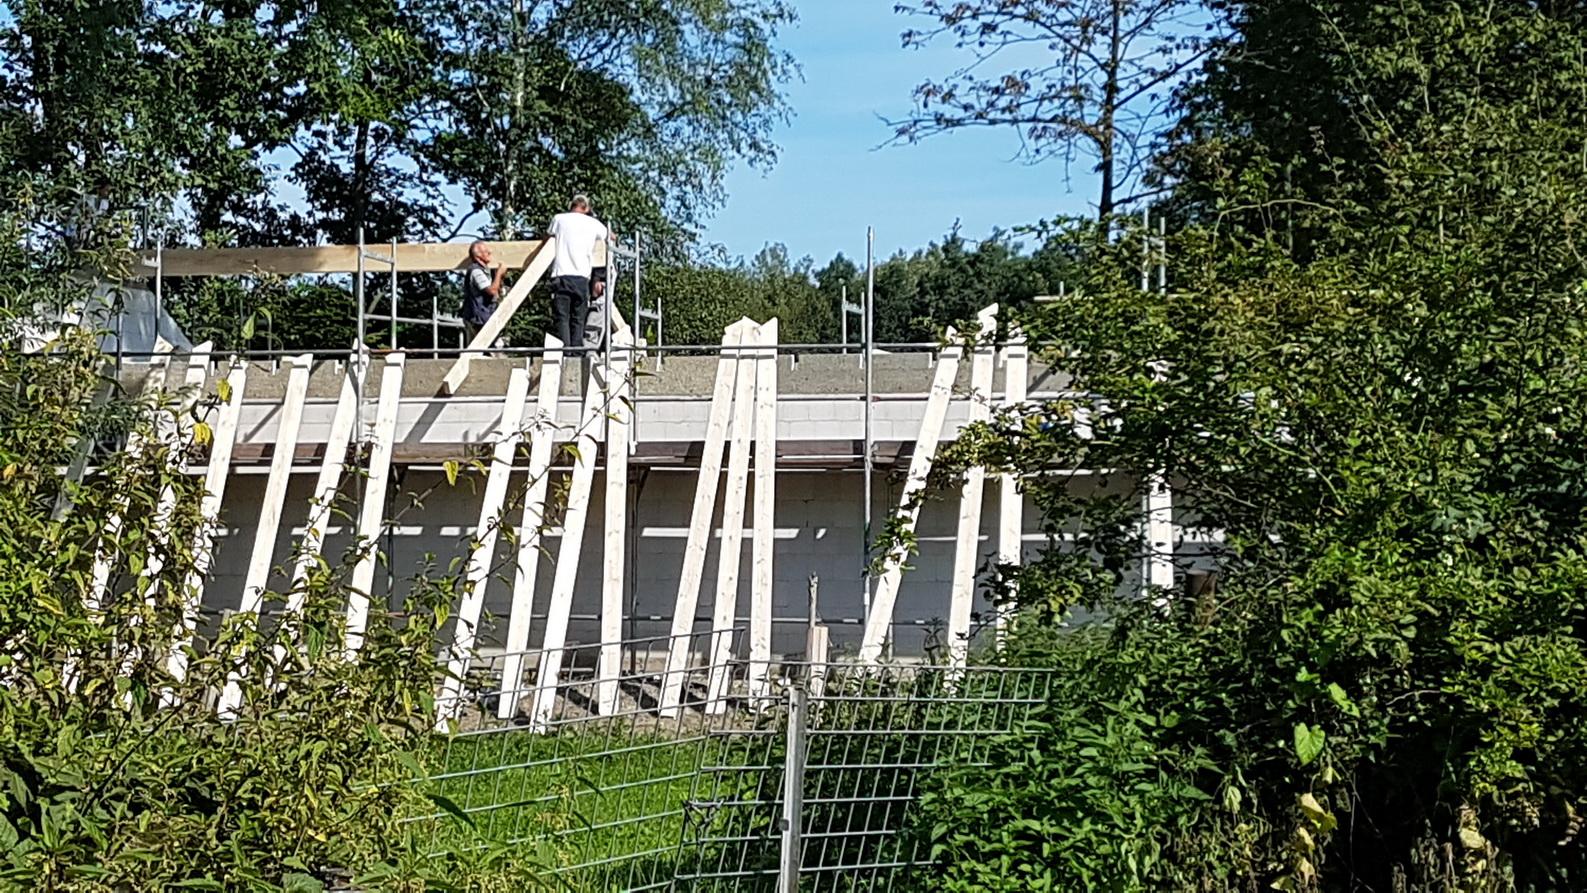 20170823_110610_001 Dachstuhl aufstellen aa